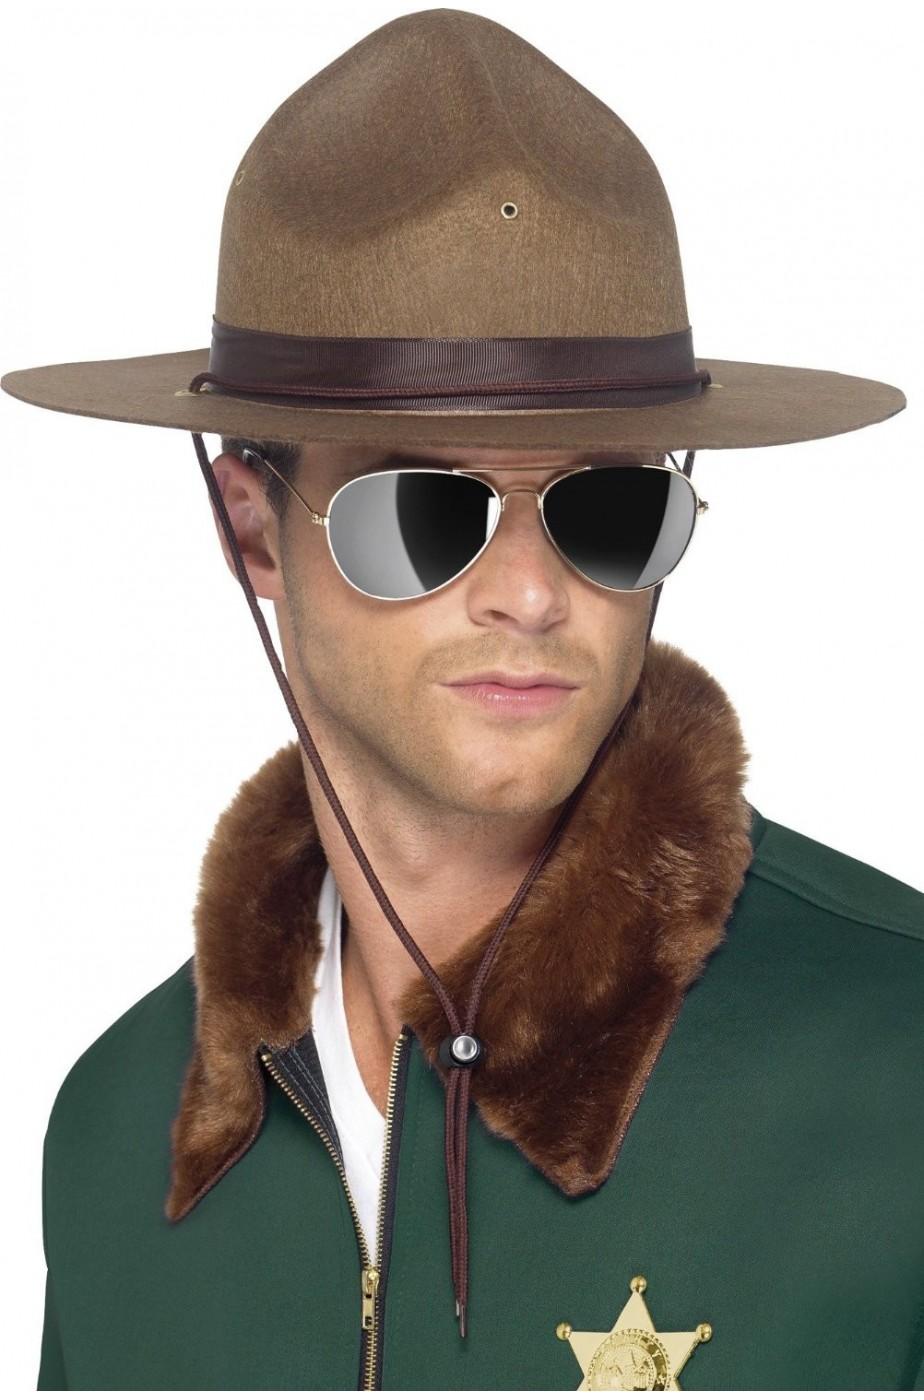 Cappello sceriffo ranger sergente marines floccato adulto Clint Eastwood